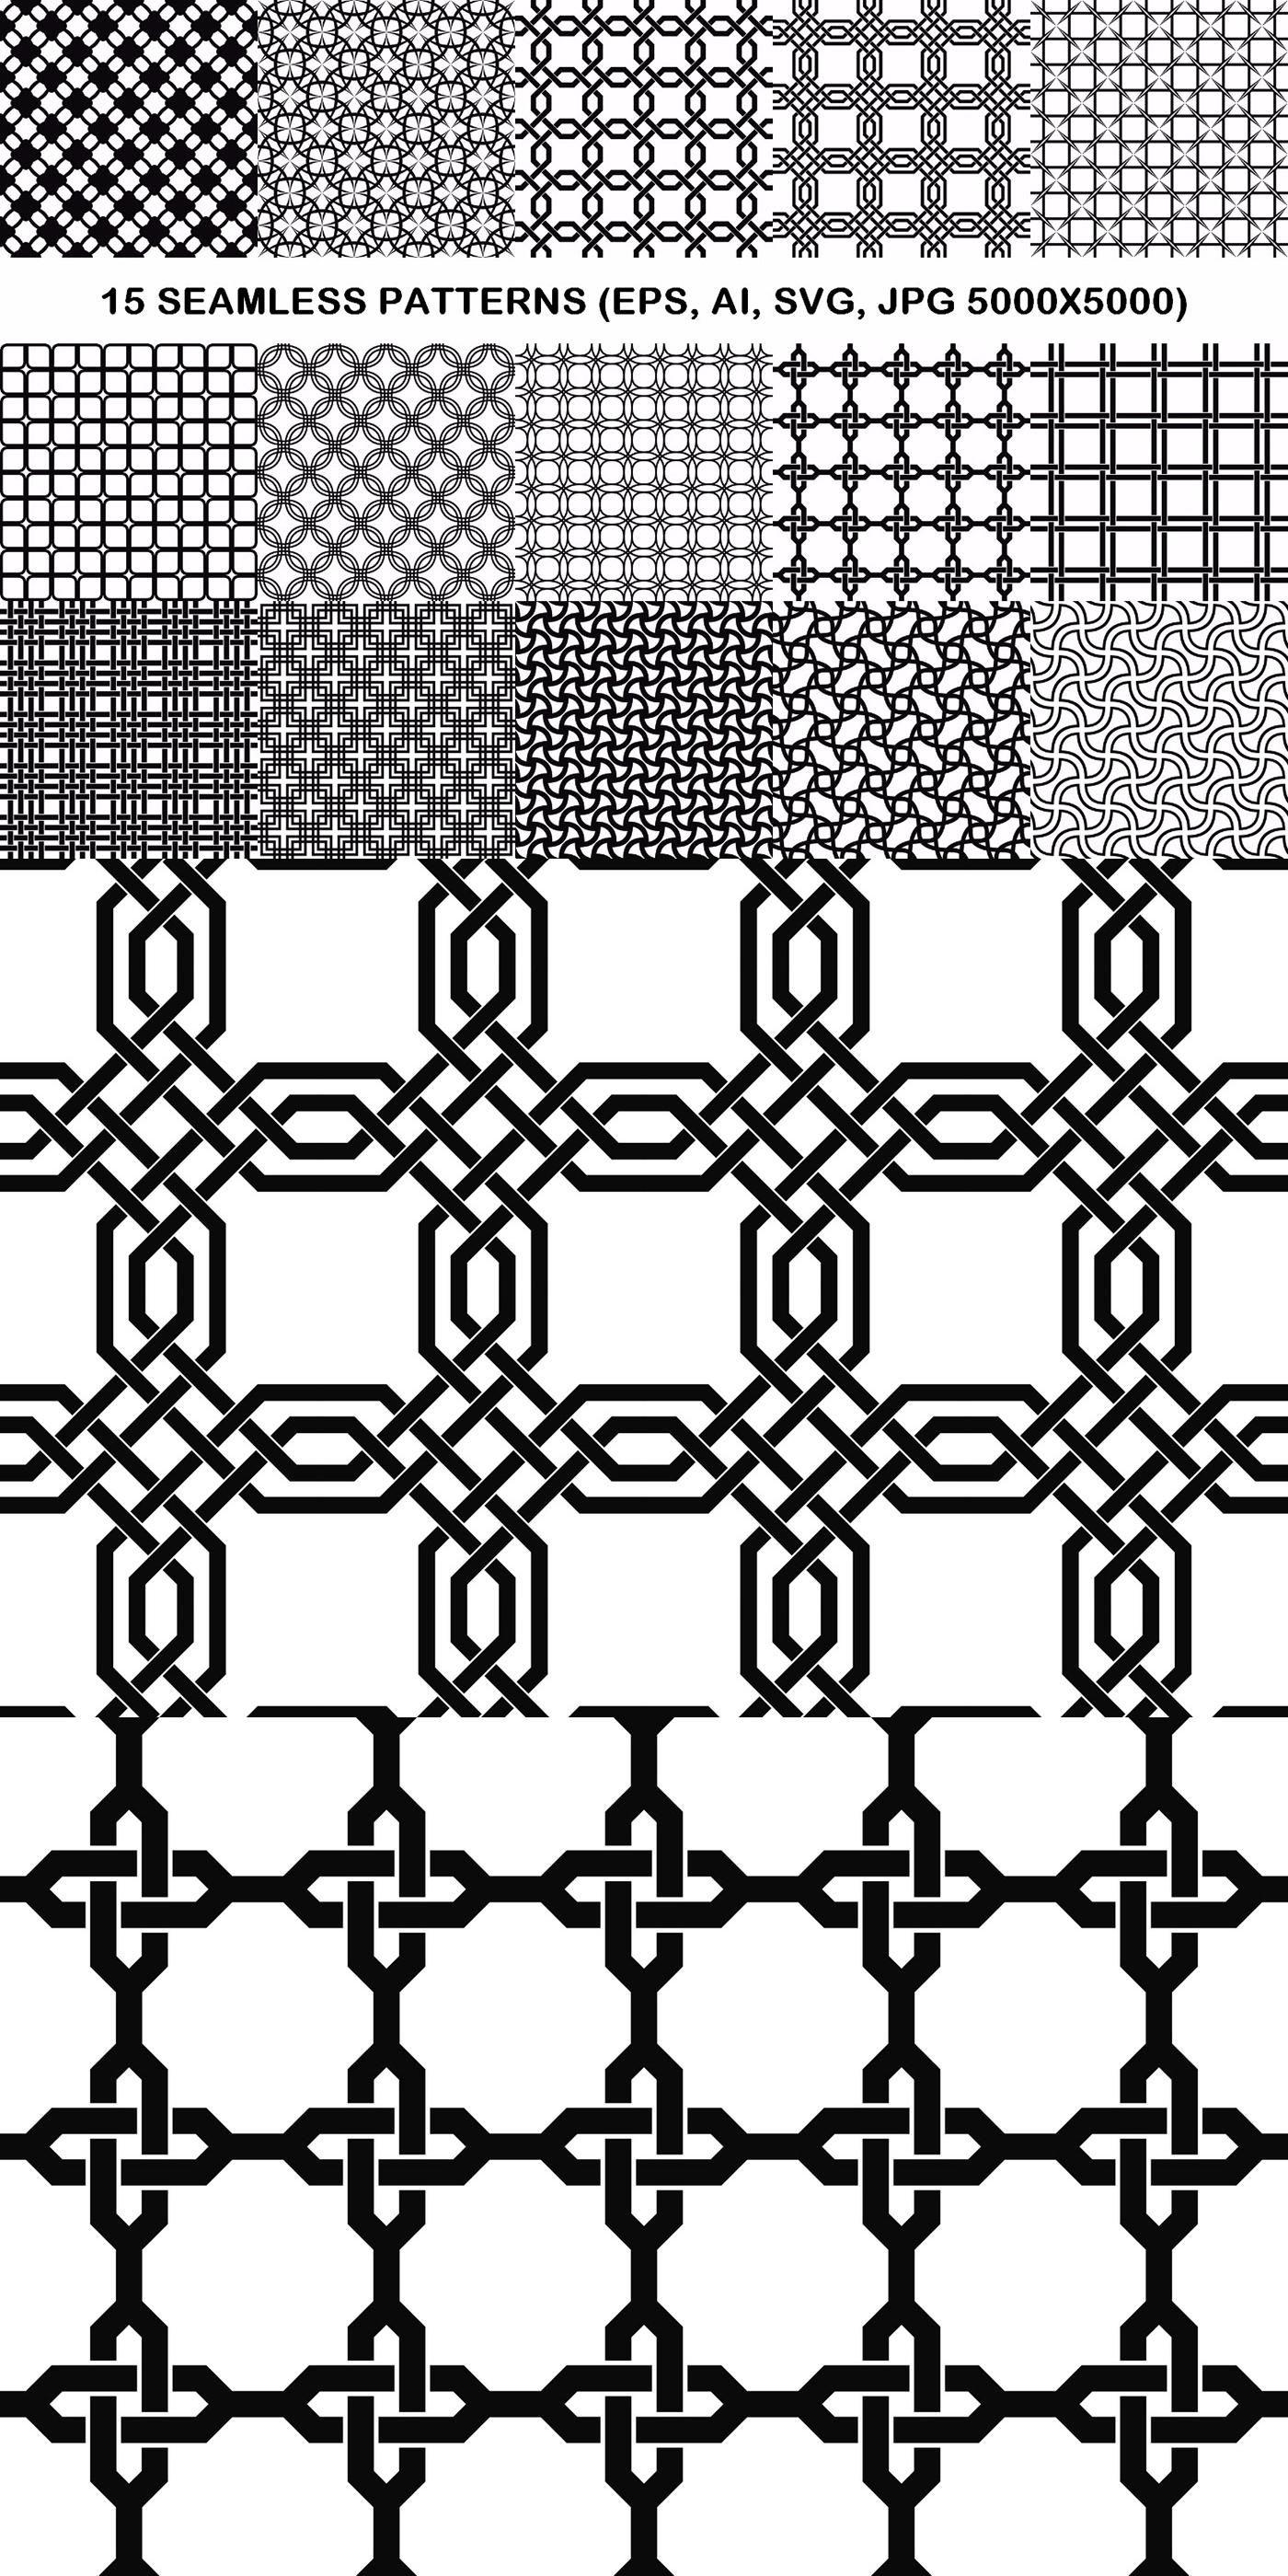 15 Seamless Grid Patterns Pattern Monochrome Lattice Seamless Graphicdesign Monochromegraphic Vec Monochrome Pattern Geometric Background Vector Pattern